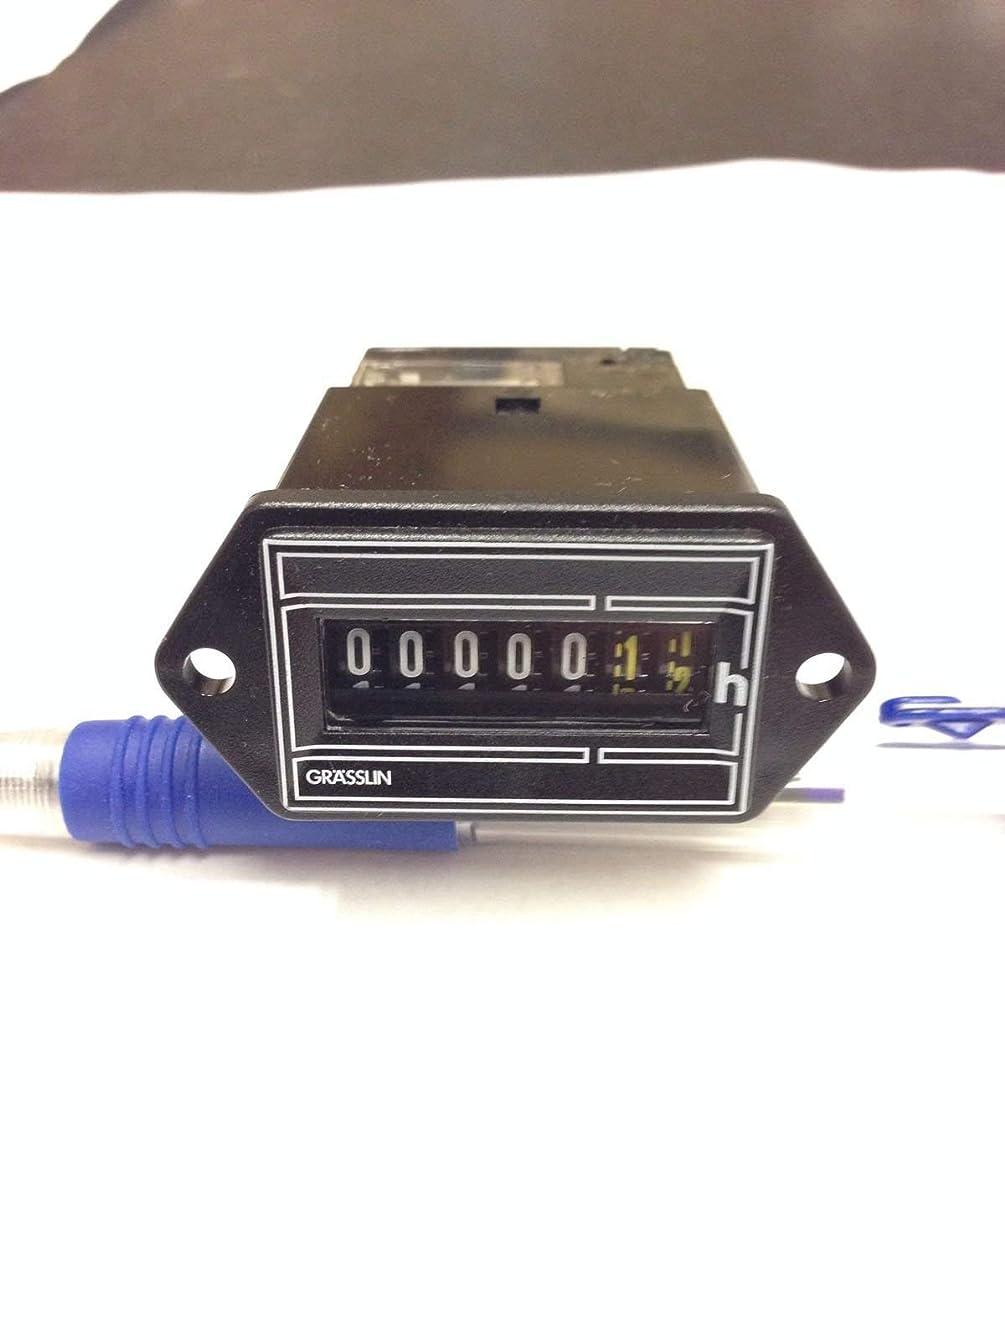 Grasslin Hour Meter FWZ35 24 To 30 Volt AC Timer FWZ35-24u filter air conditioner run hours